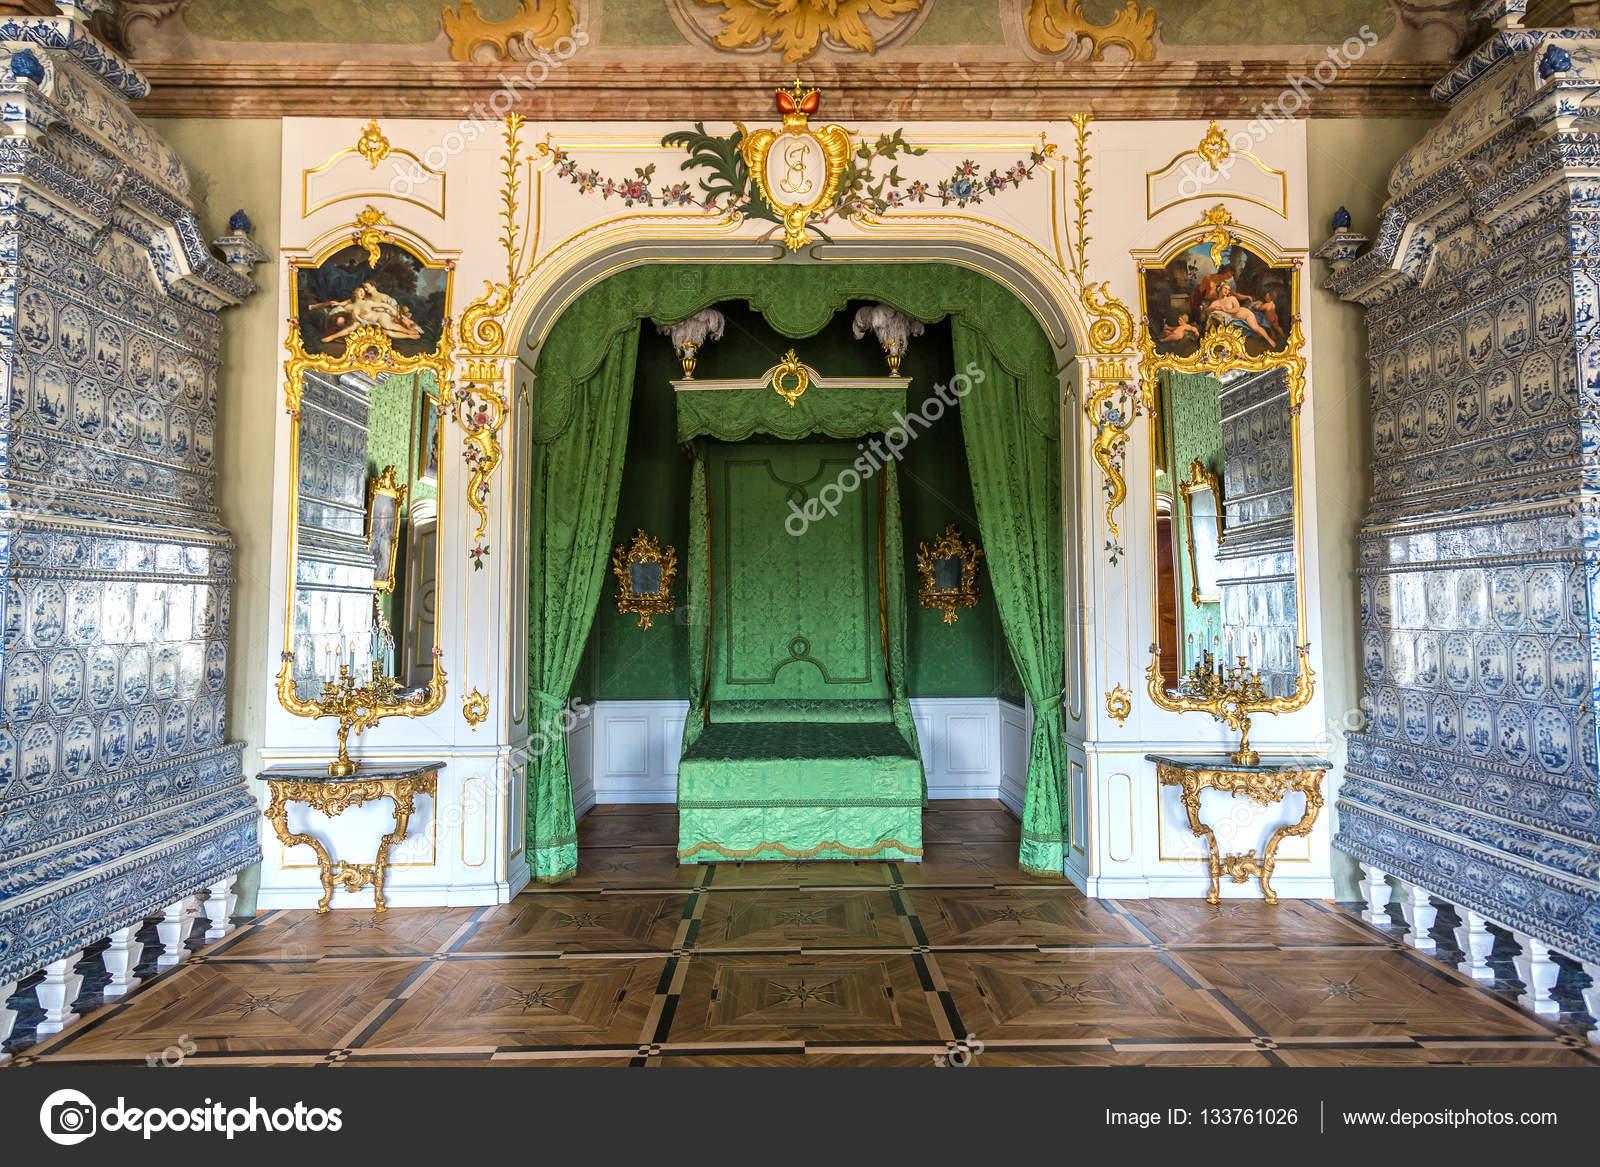 https://st3.depositphotos.com/1000633/13376/i/1600/depositphotos_133761026-stockafbeelding-prachtige-antieke-interieur.jpg